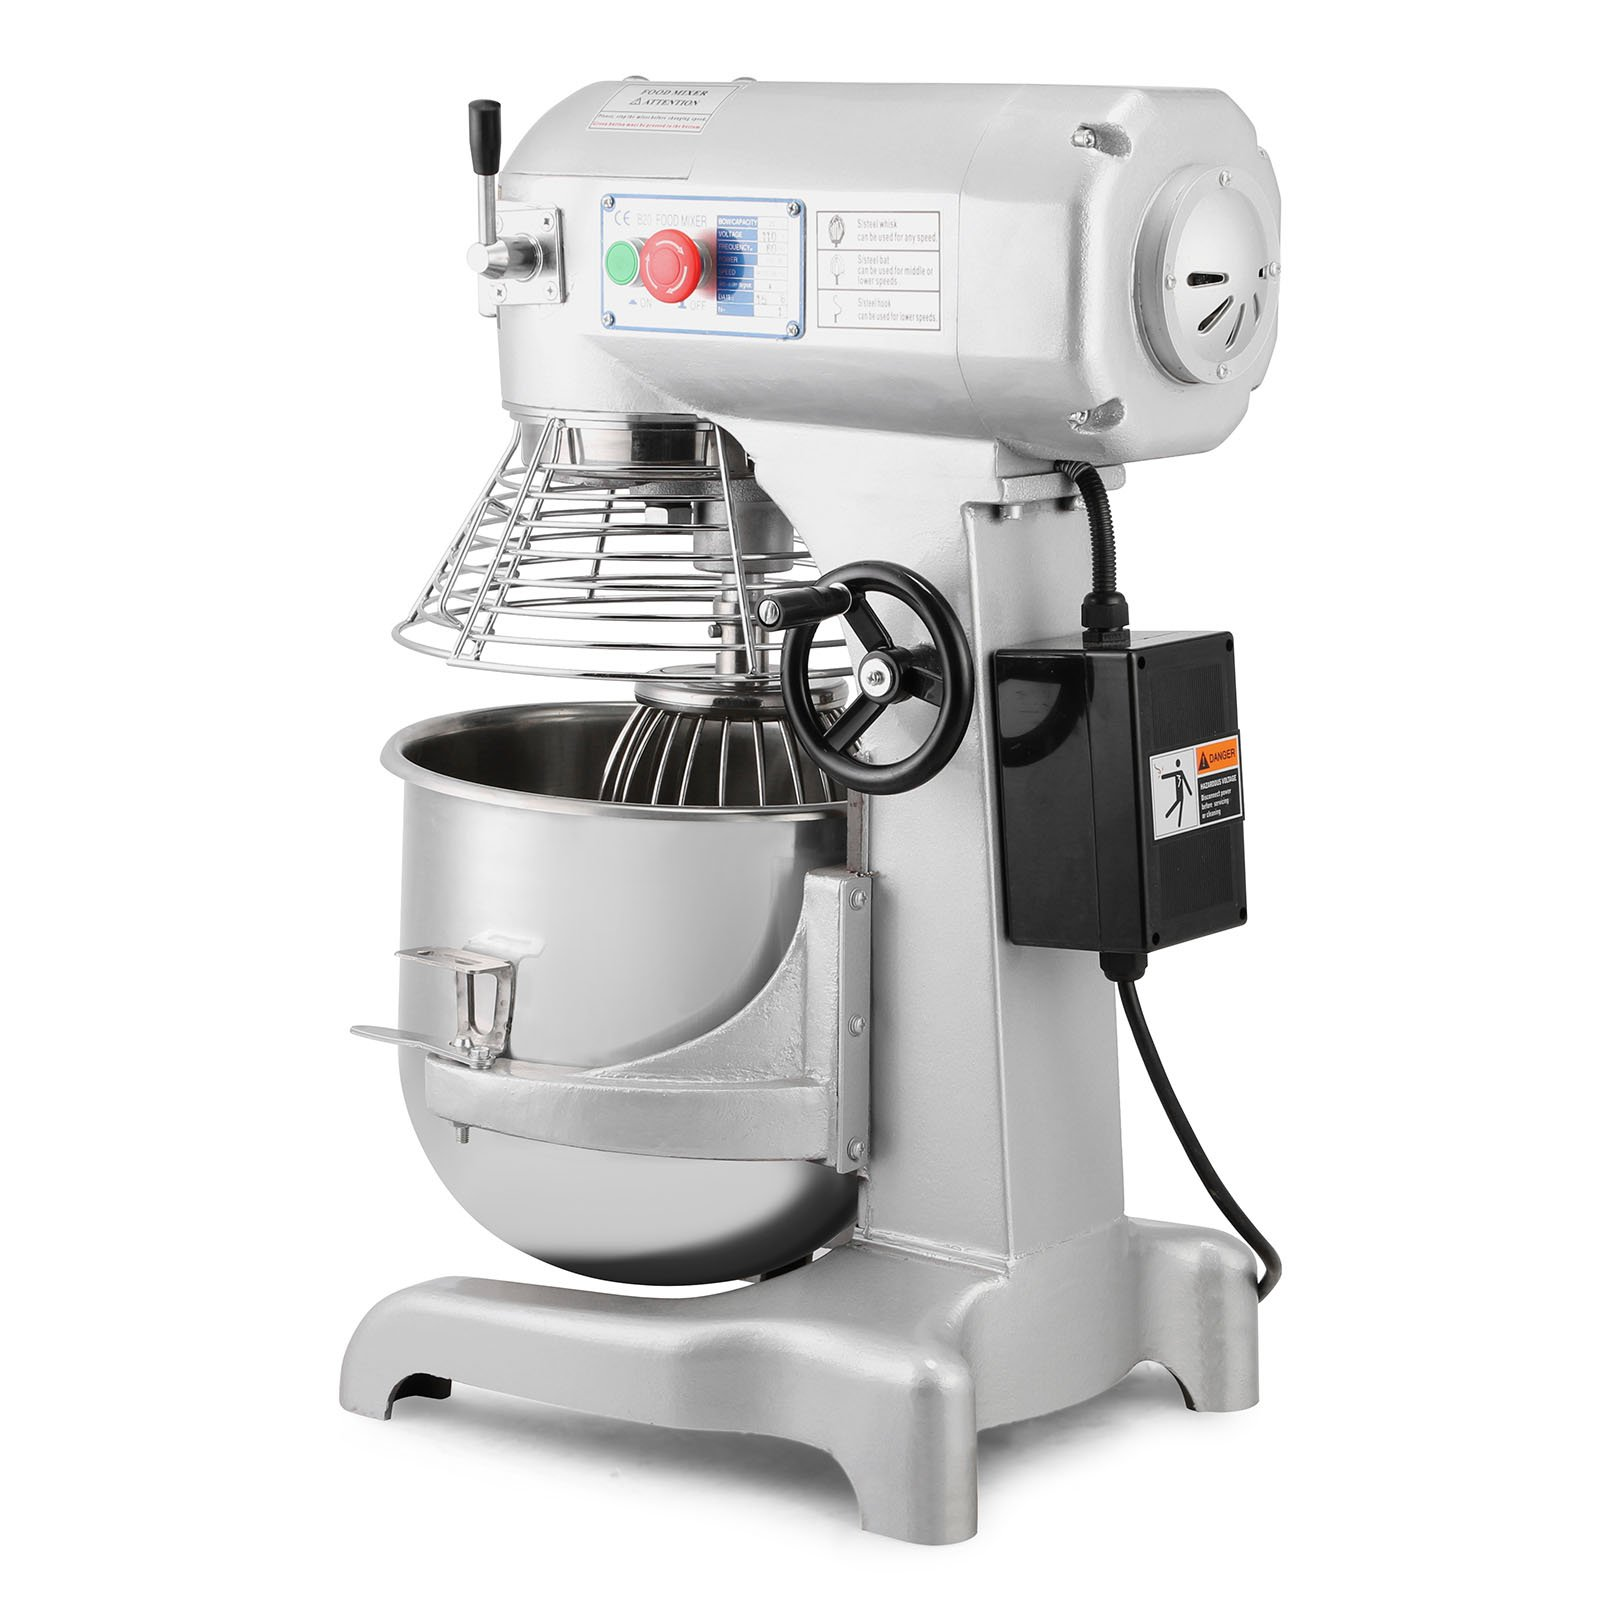 Happybuy Commercial Food Mixer 750W Dough Mixer Maker 3 Speeds Adjustable Commercial Mixer Grinder 94/165/386 RPM Stand Mixer (20 qt) by Happybuy (Image #3)